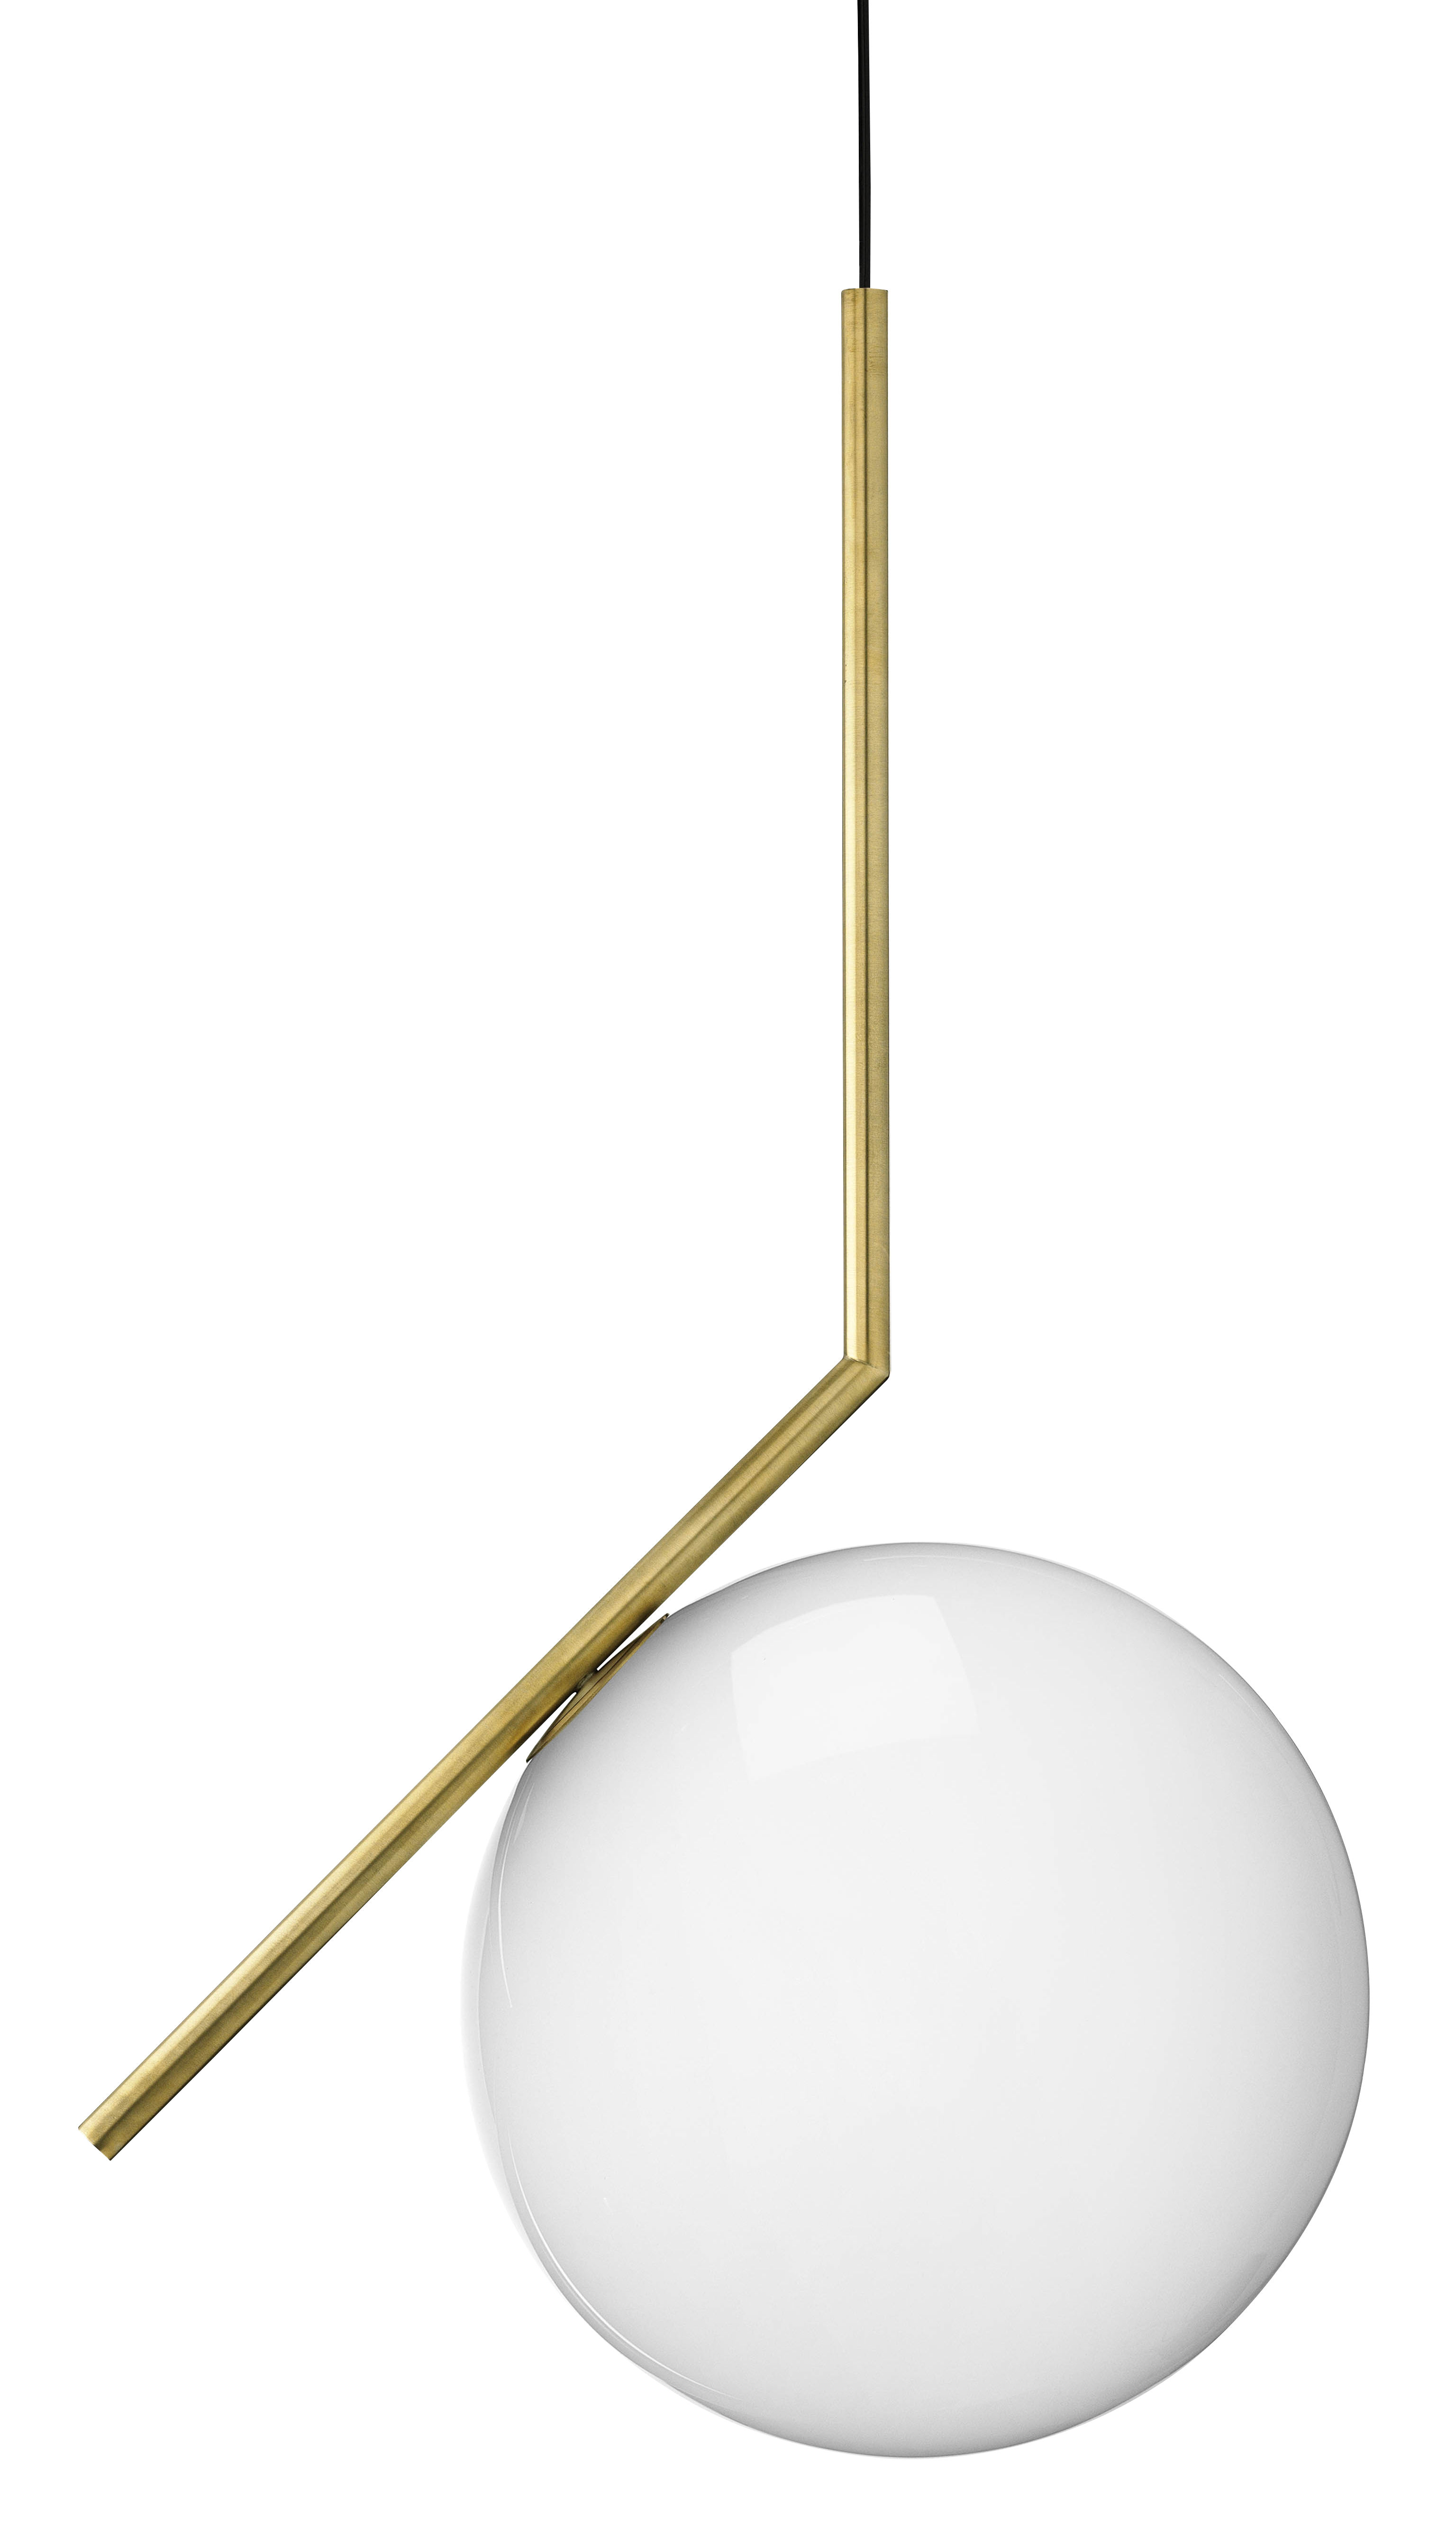 Lighting - Pendant Lighting - IC S2 Pendant by Flos - Brass - Blown glass, Steel